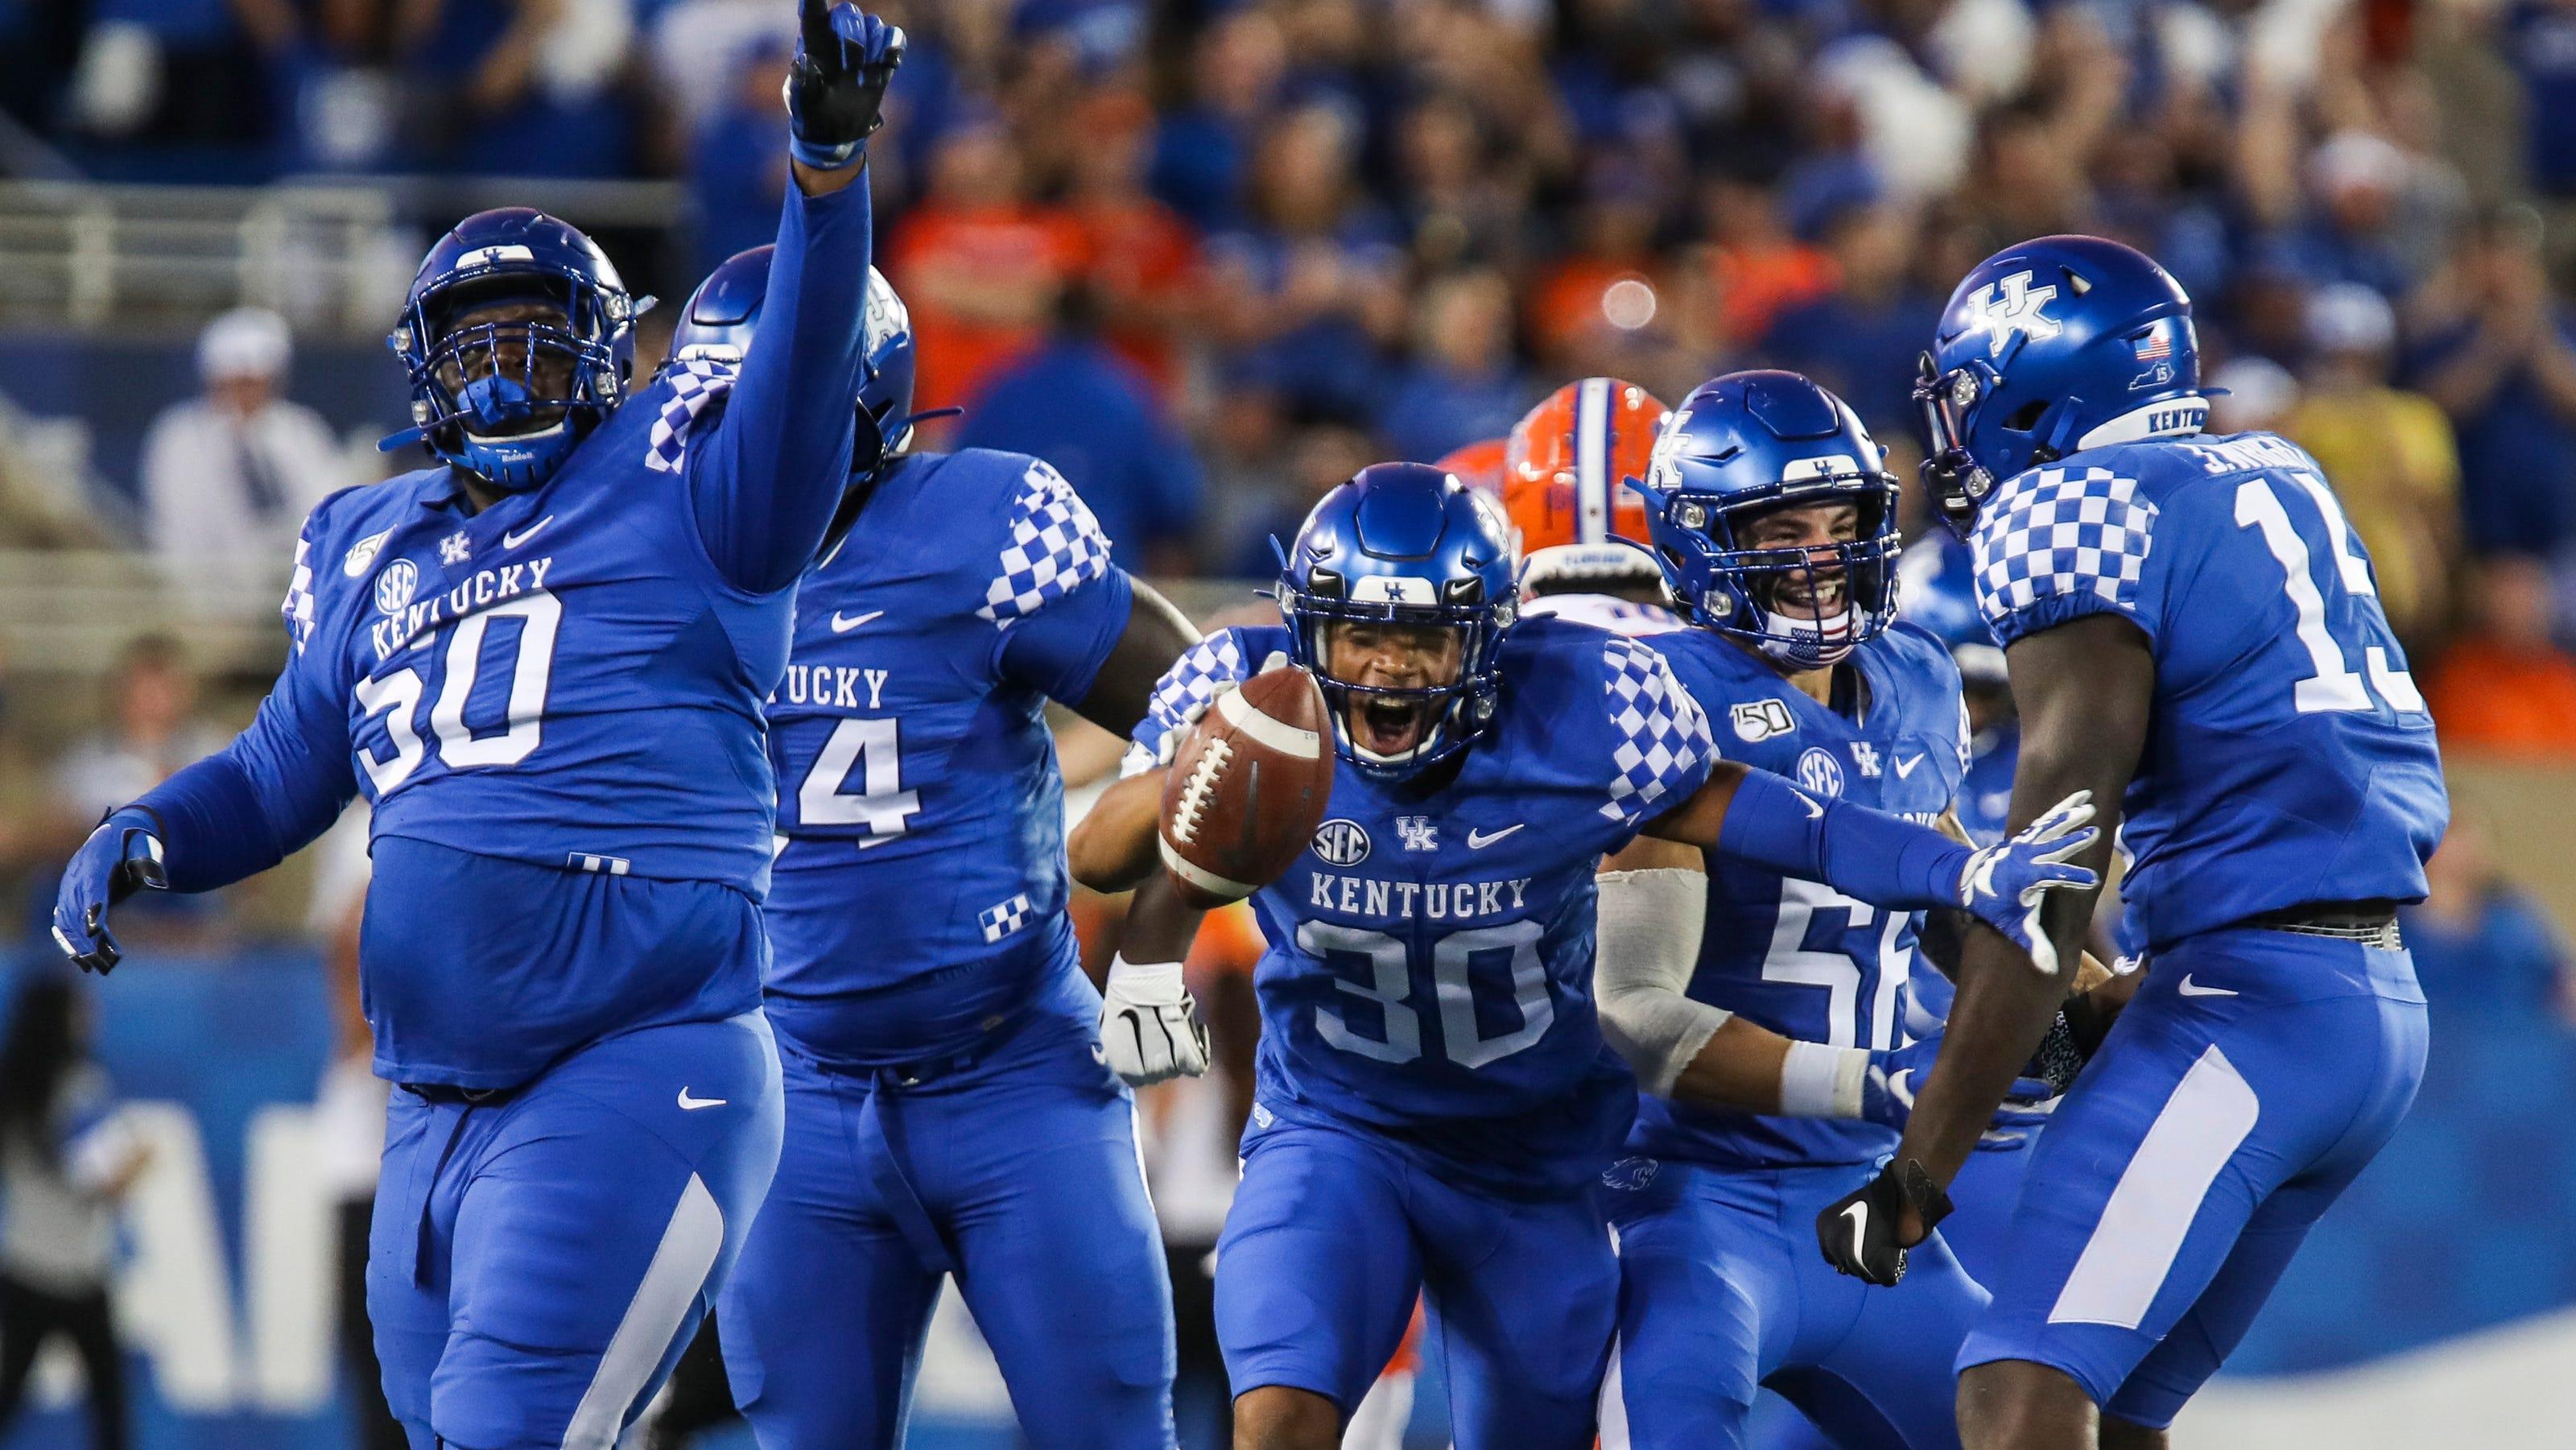 Kentucky football vs. Florida: Live score, updates and highlights